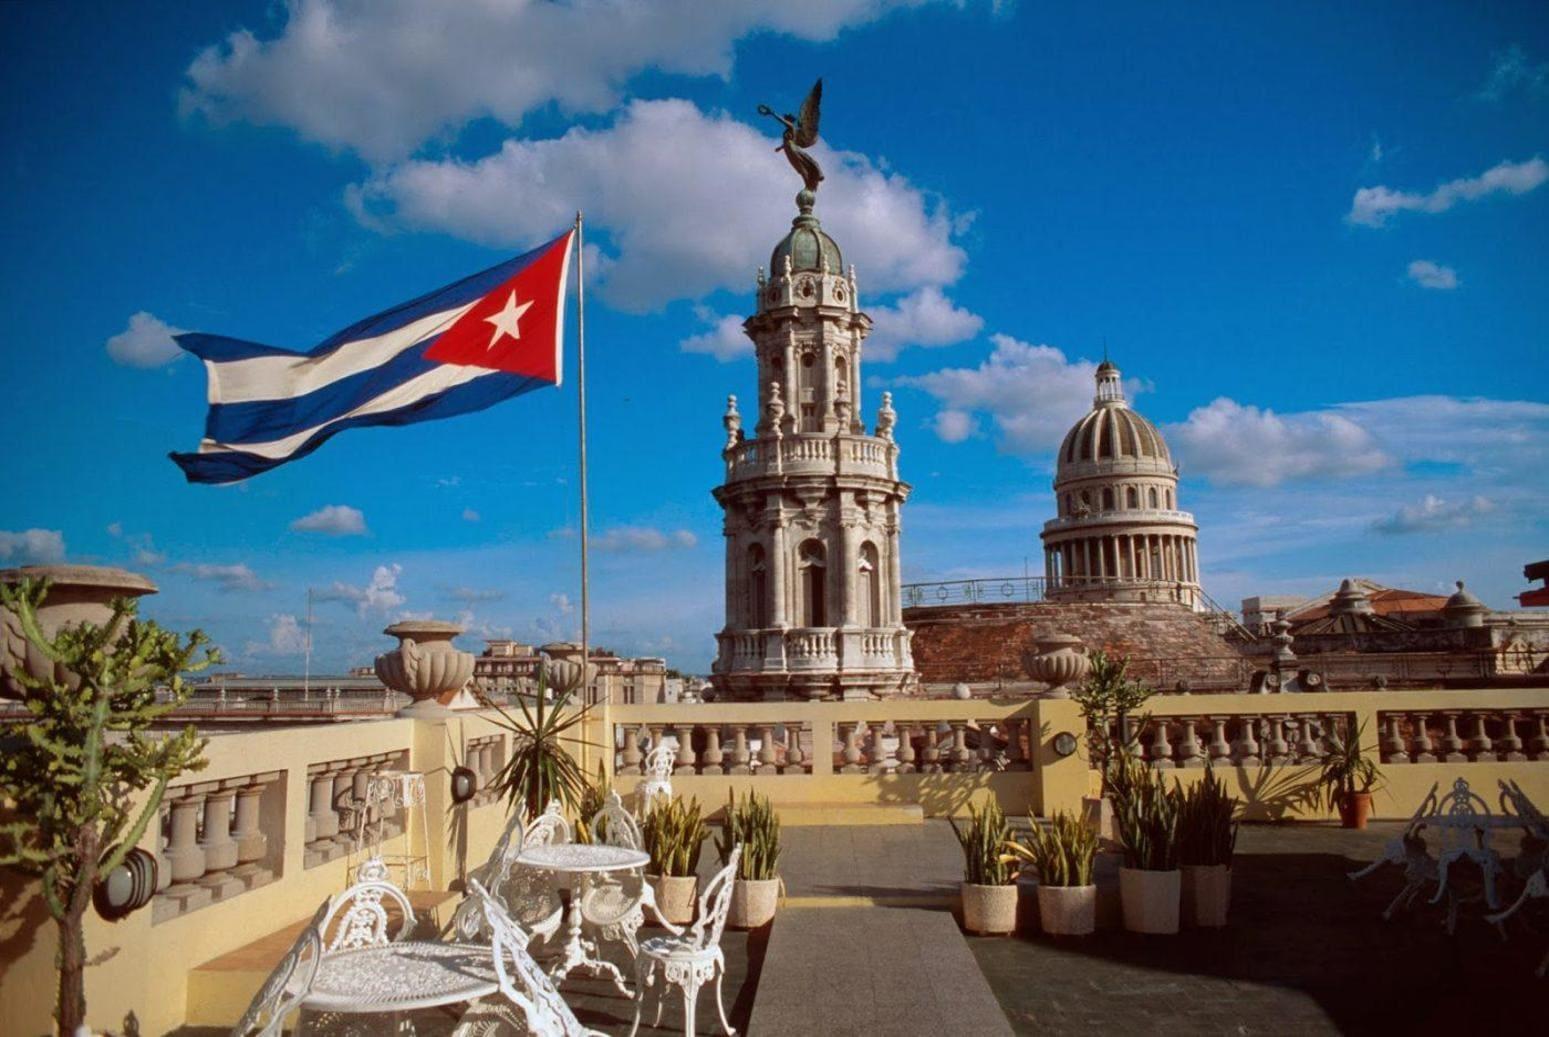 Российских туристов изолировали на Кубе из-за COVID-19